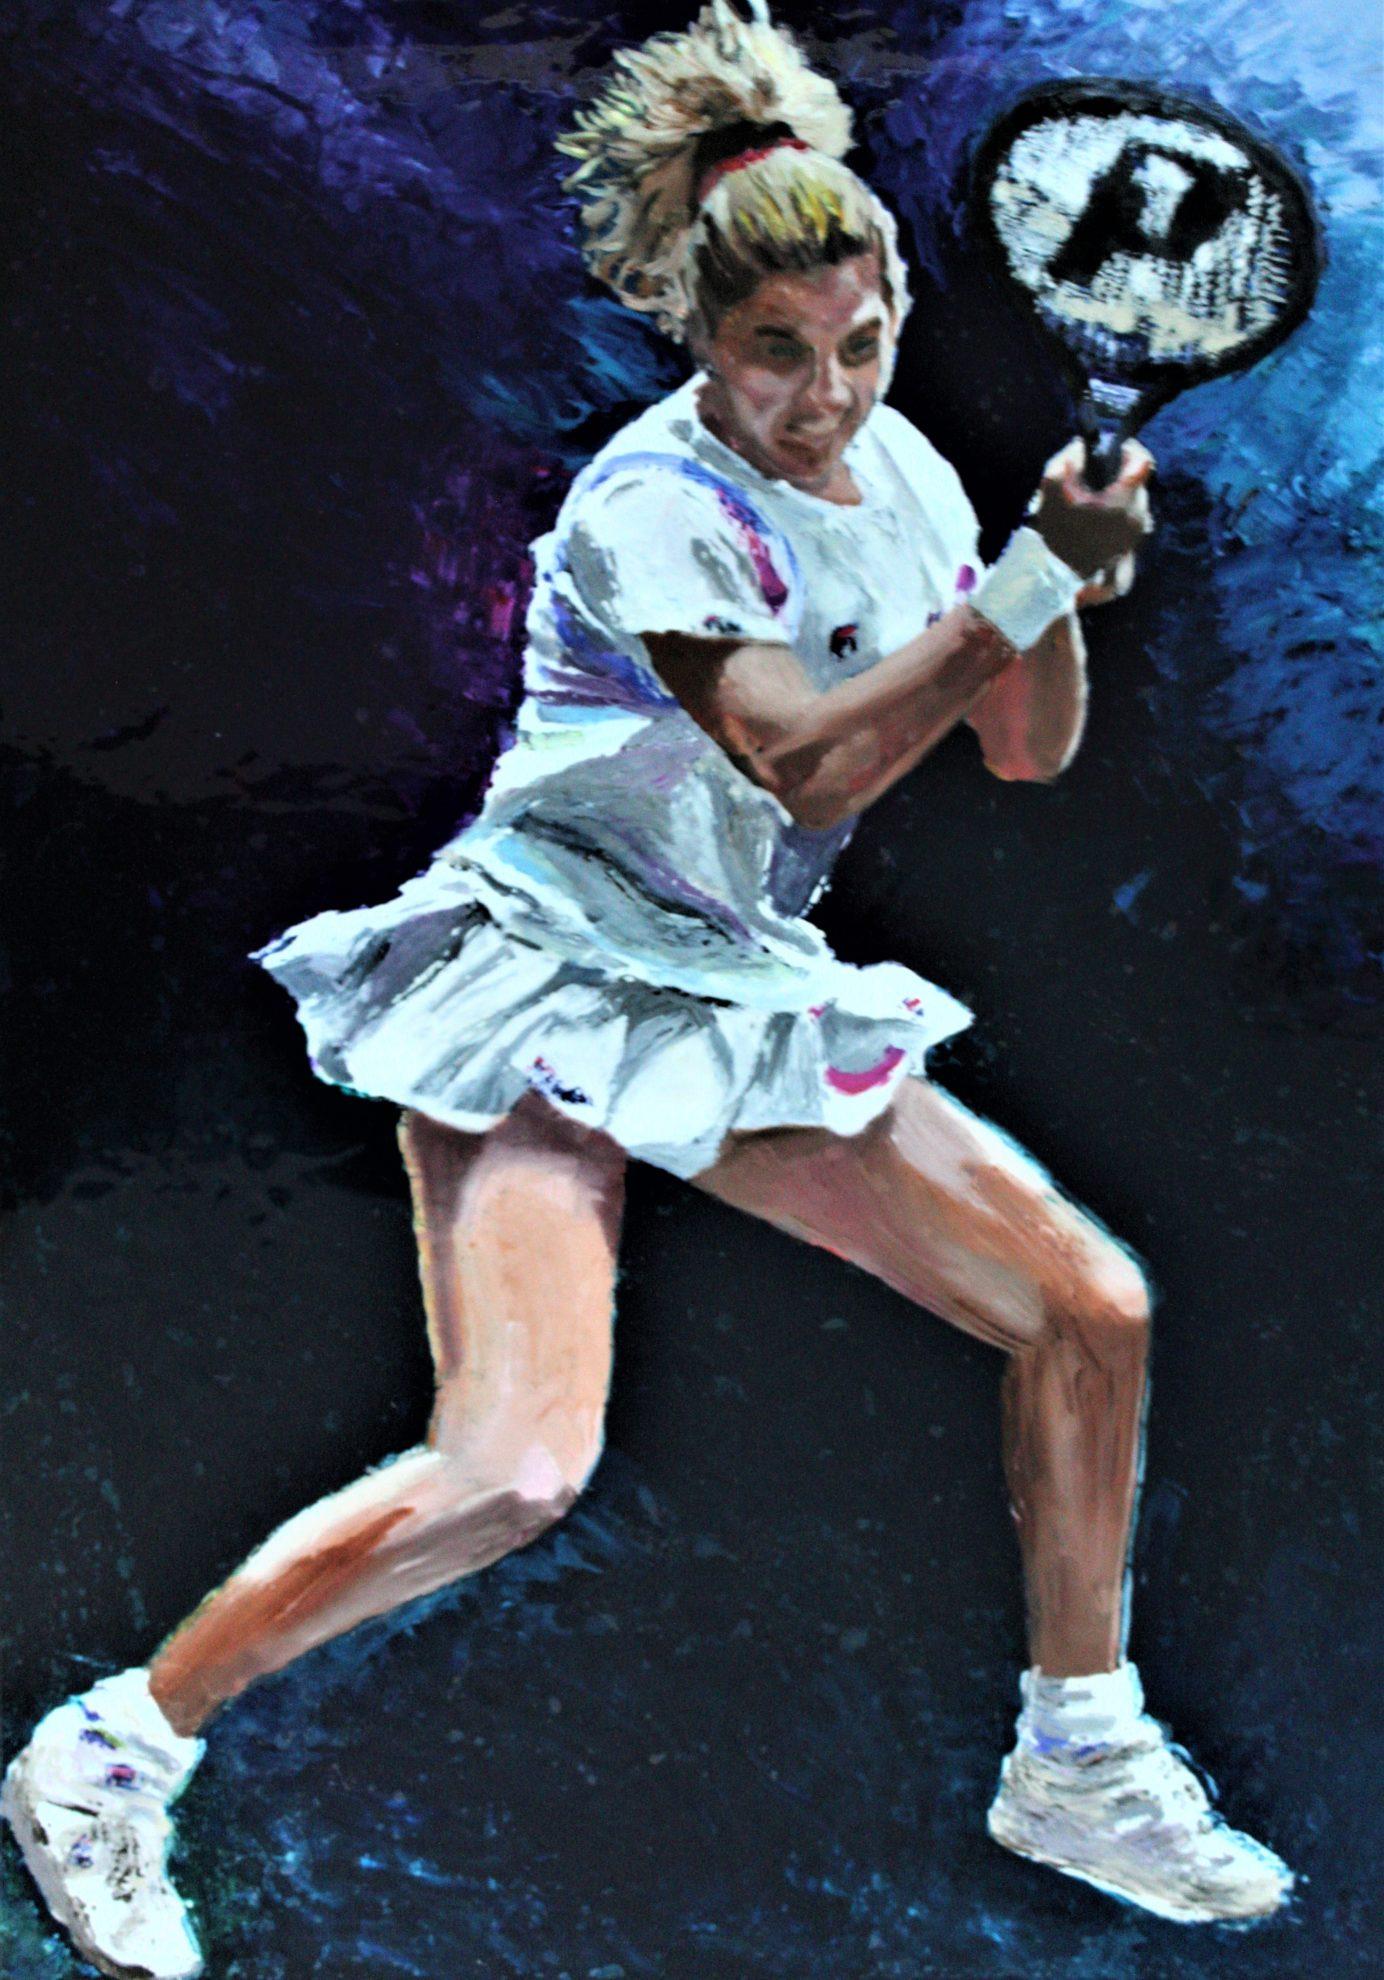 Monica Seles, 1991 US Open Champion